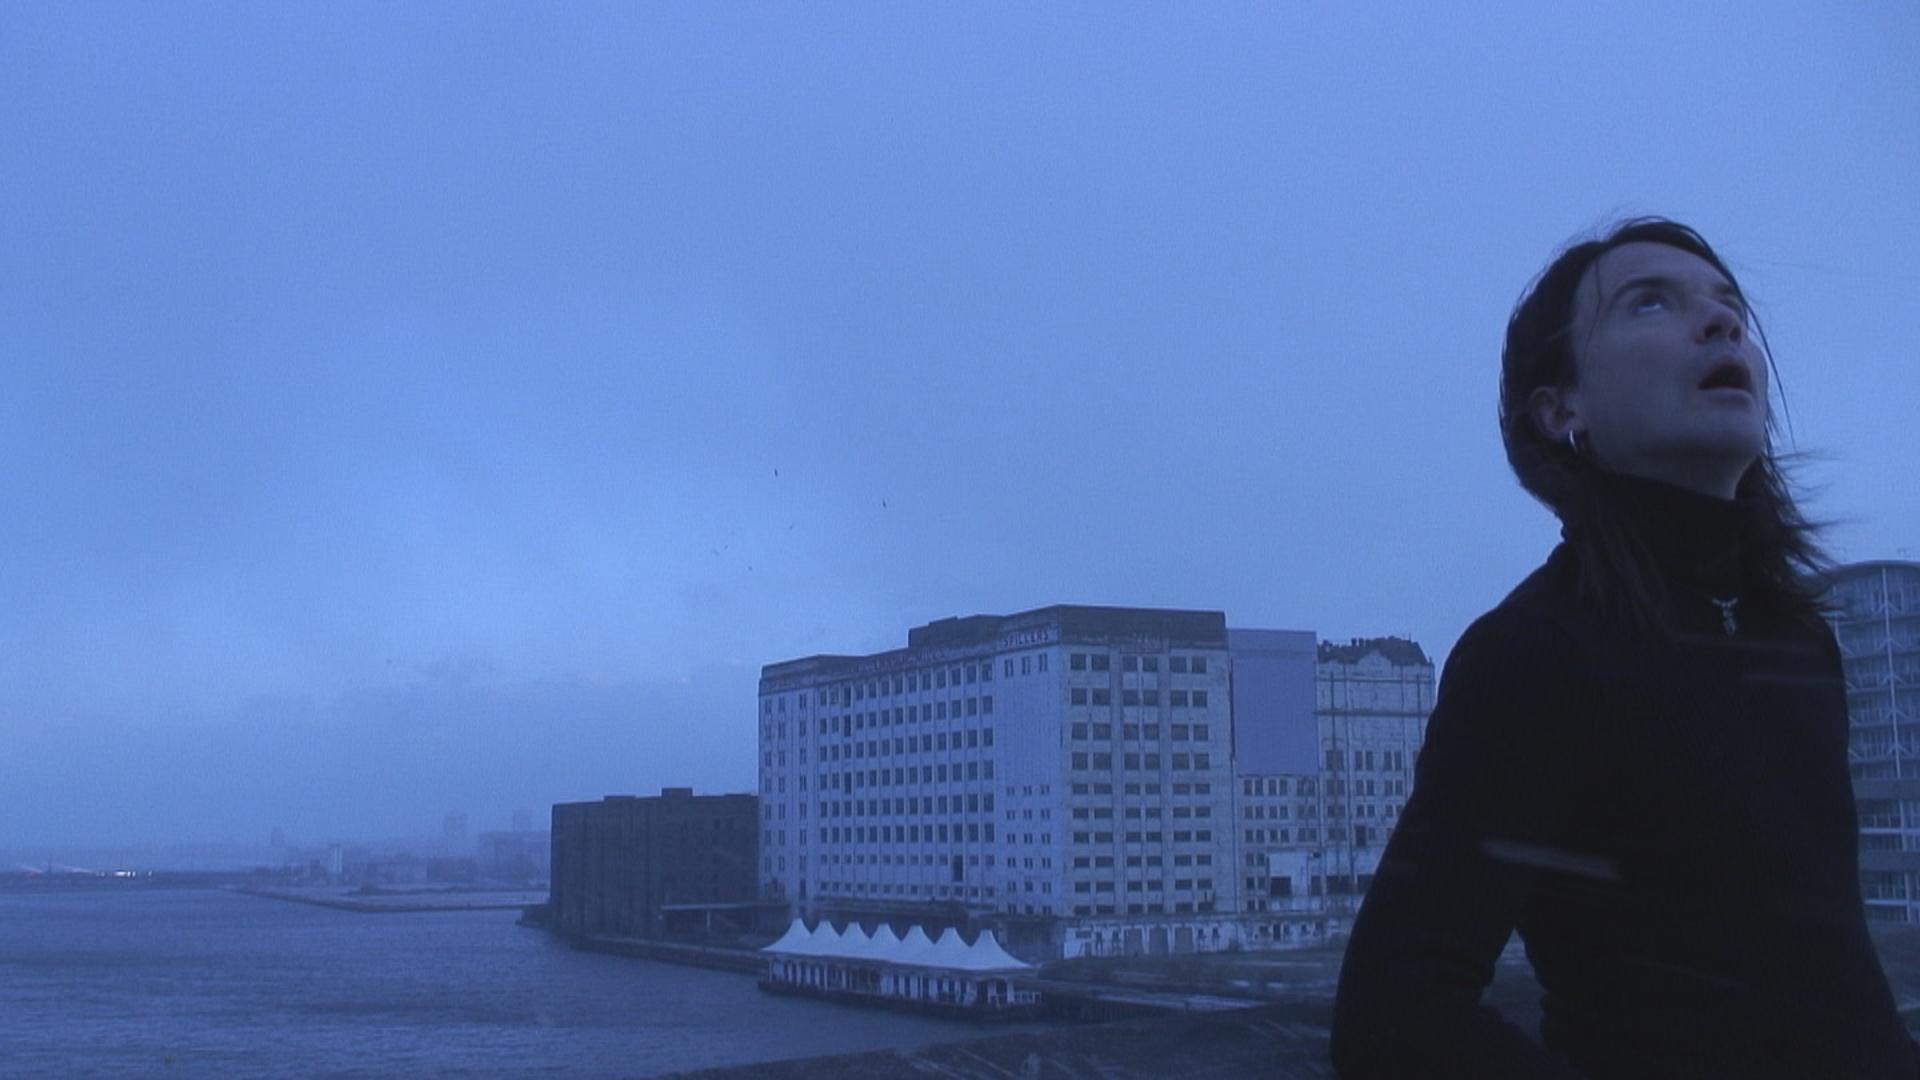 Rohan Quine, 'The Imagination Thief' - film 'MARC 5', still 11